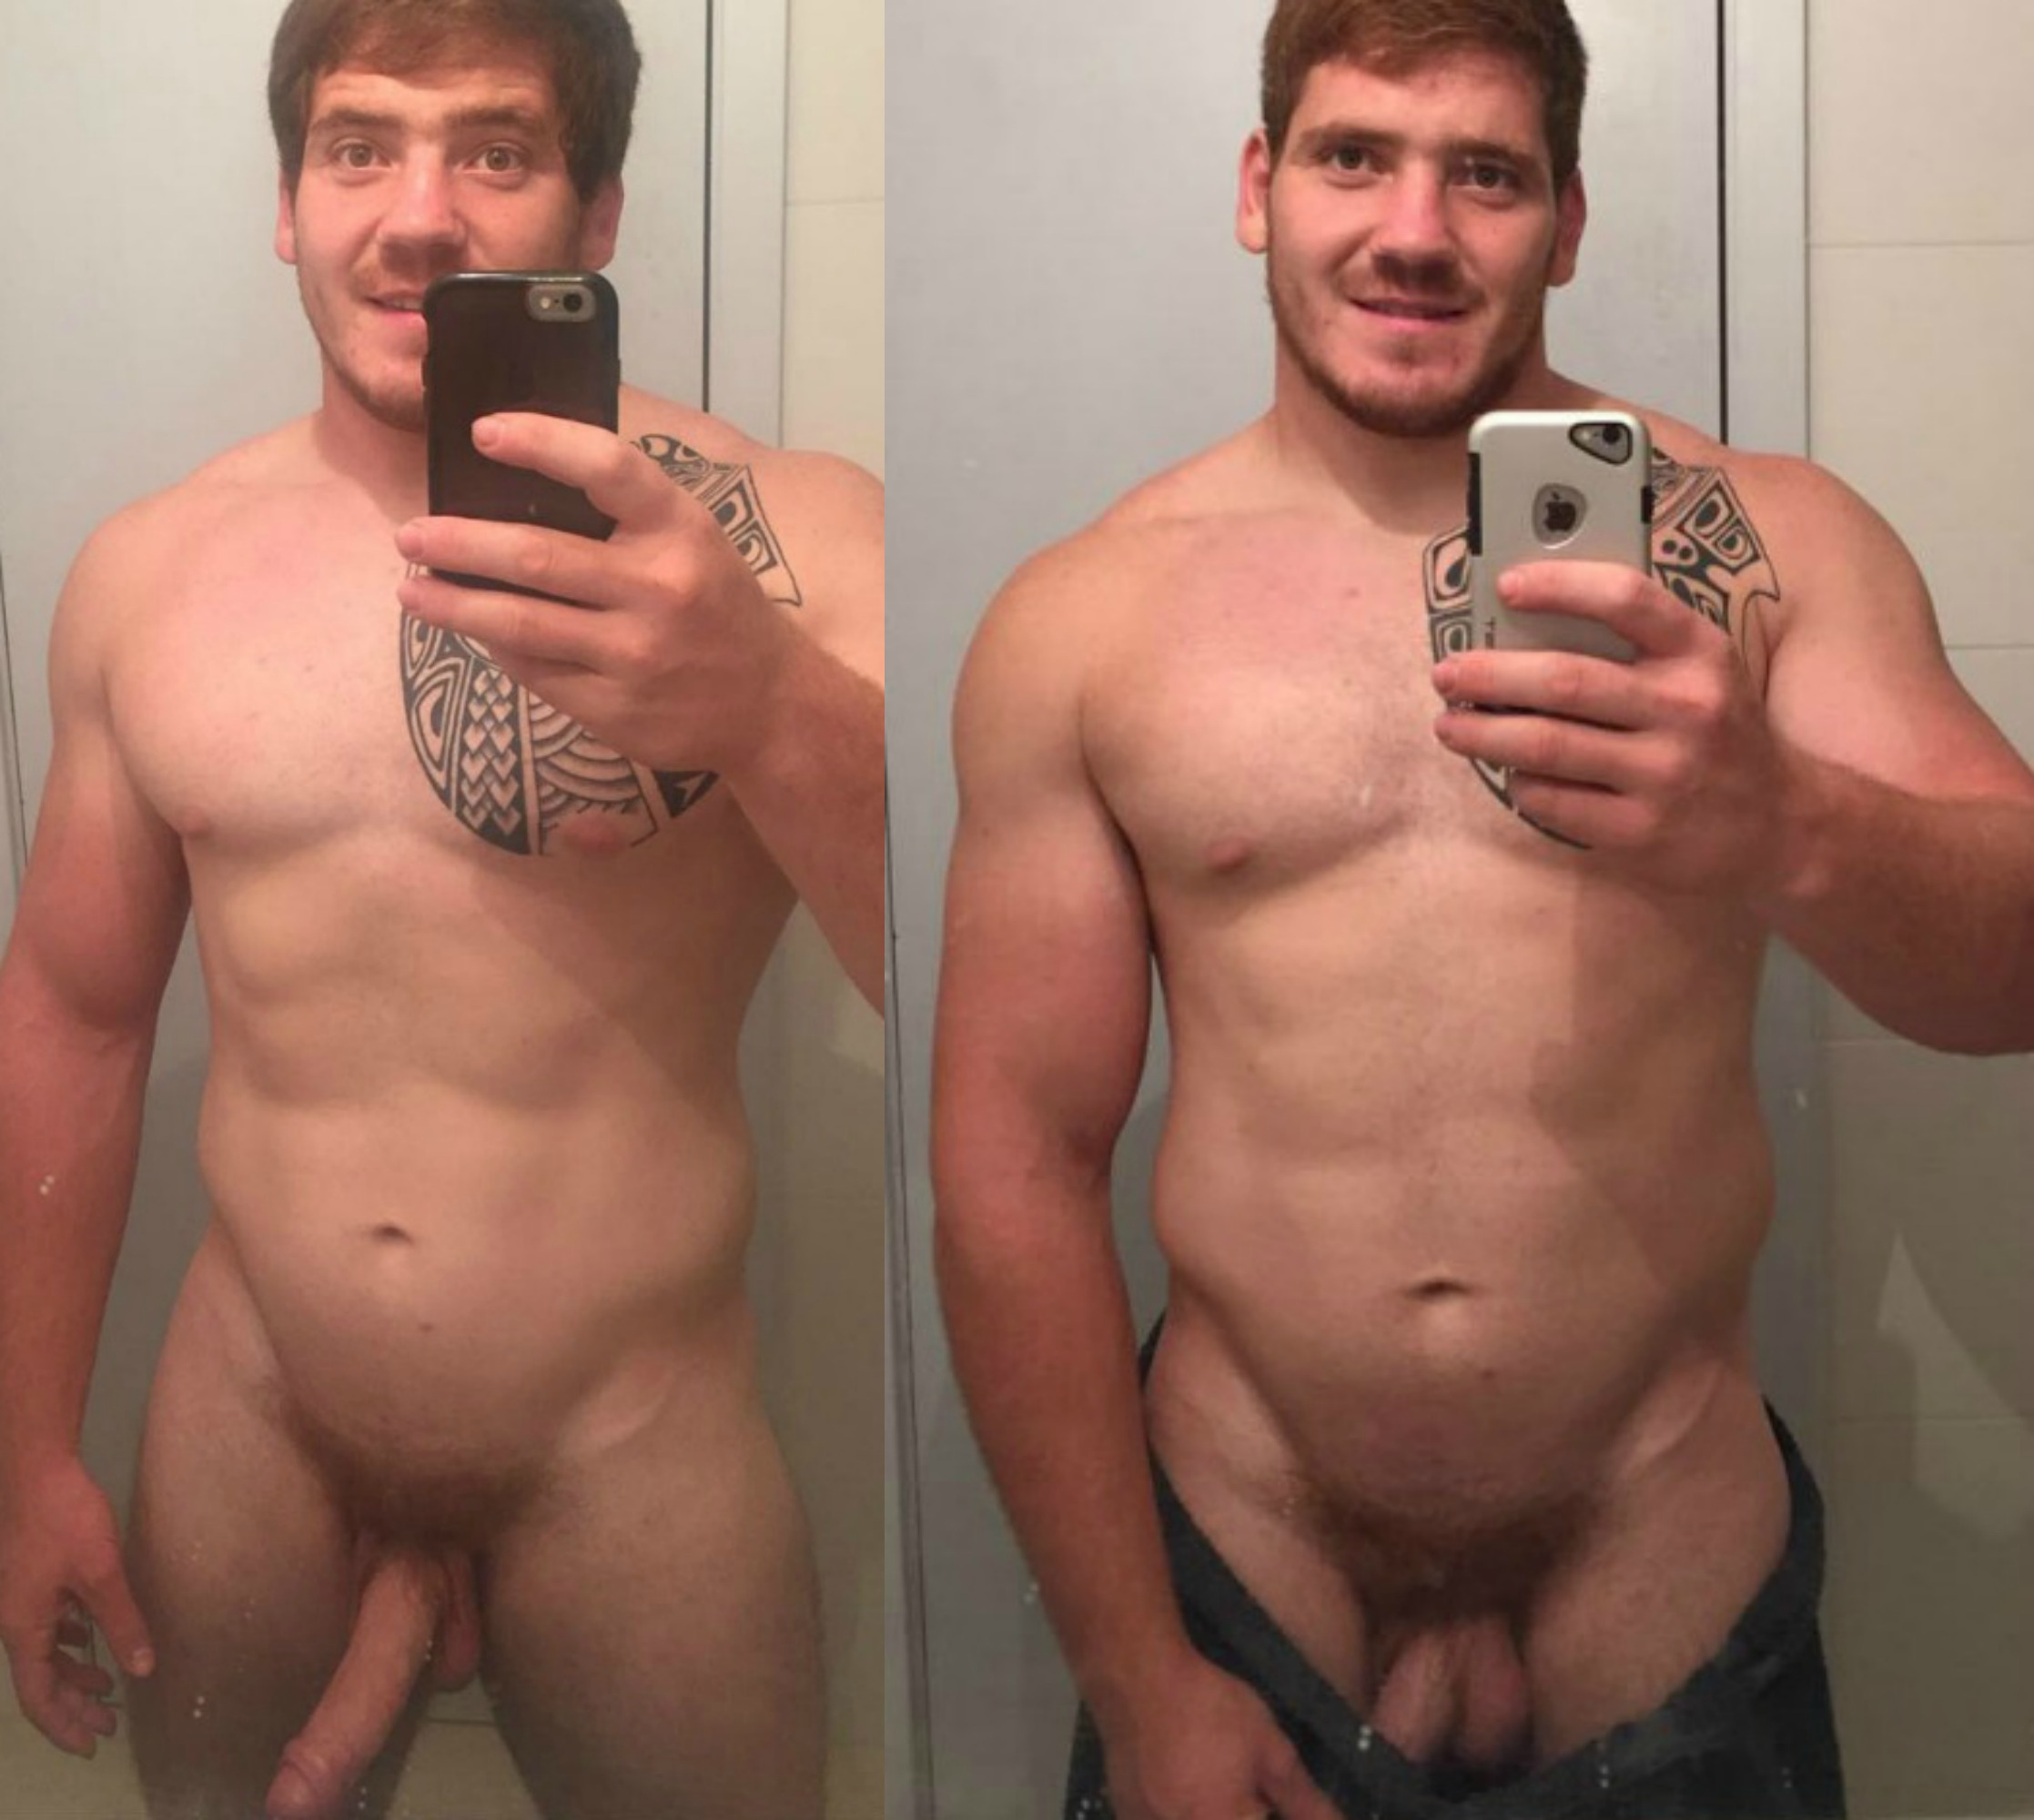 Adam brody dating 2014 imdb 2